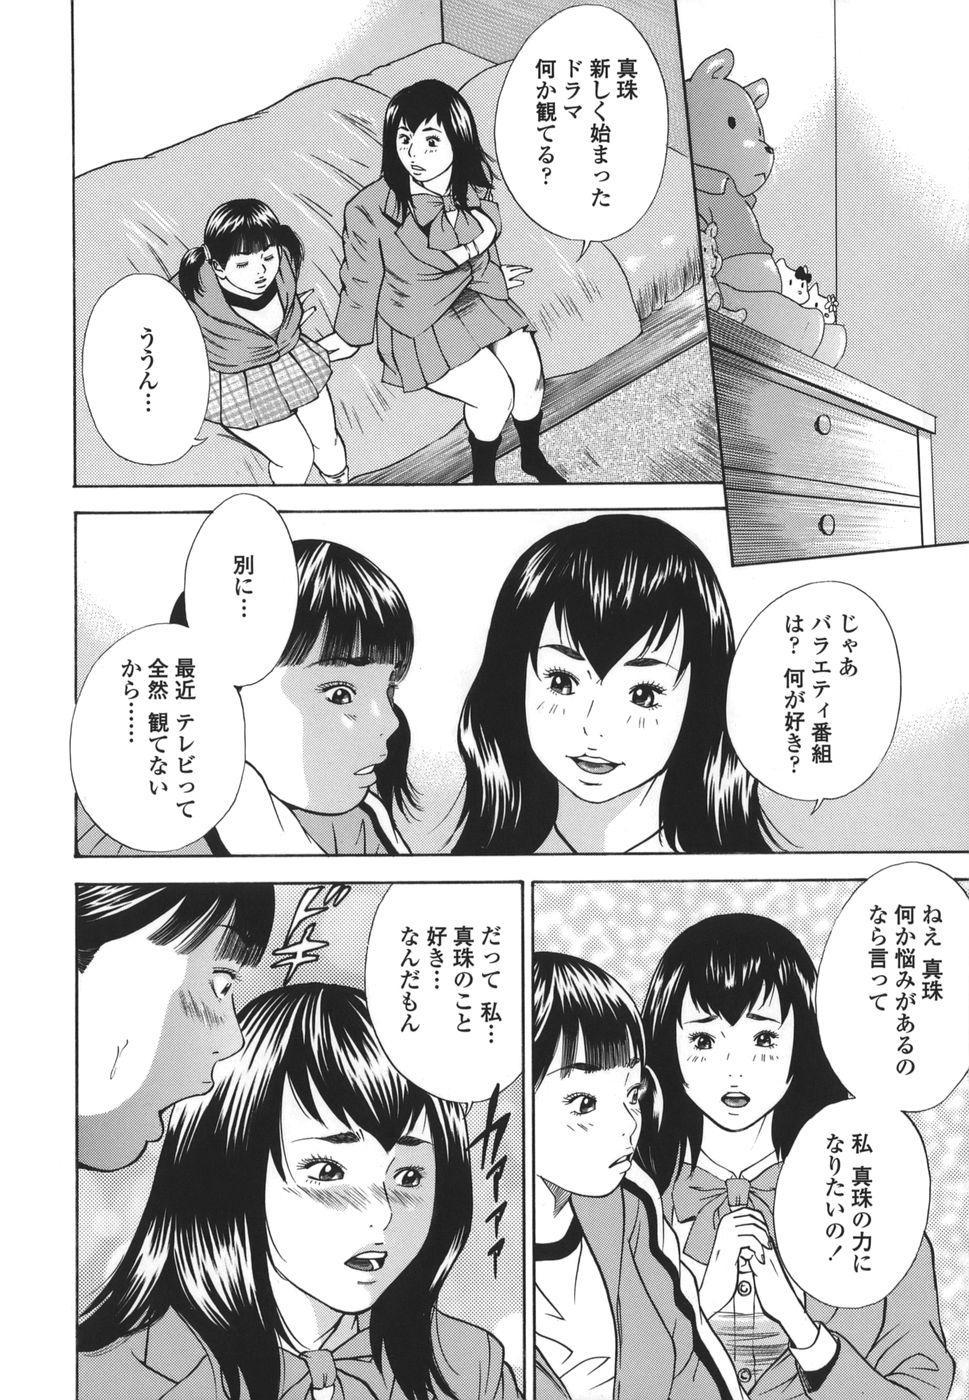 Kinshin Goukan - Near Relation Rapes 153